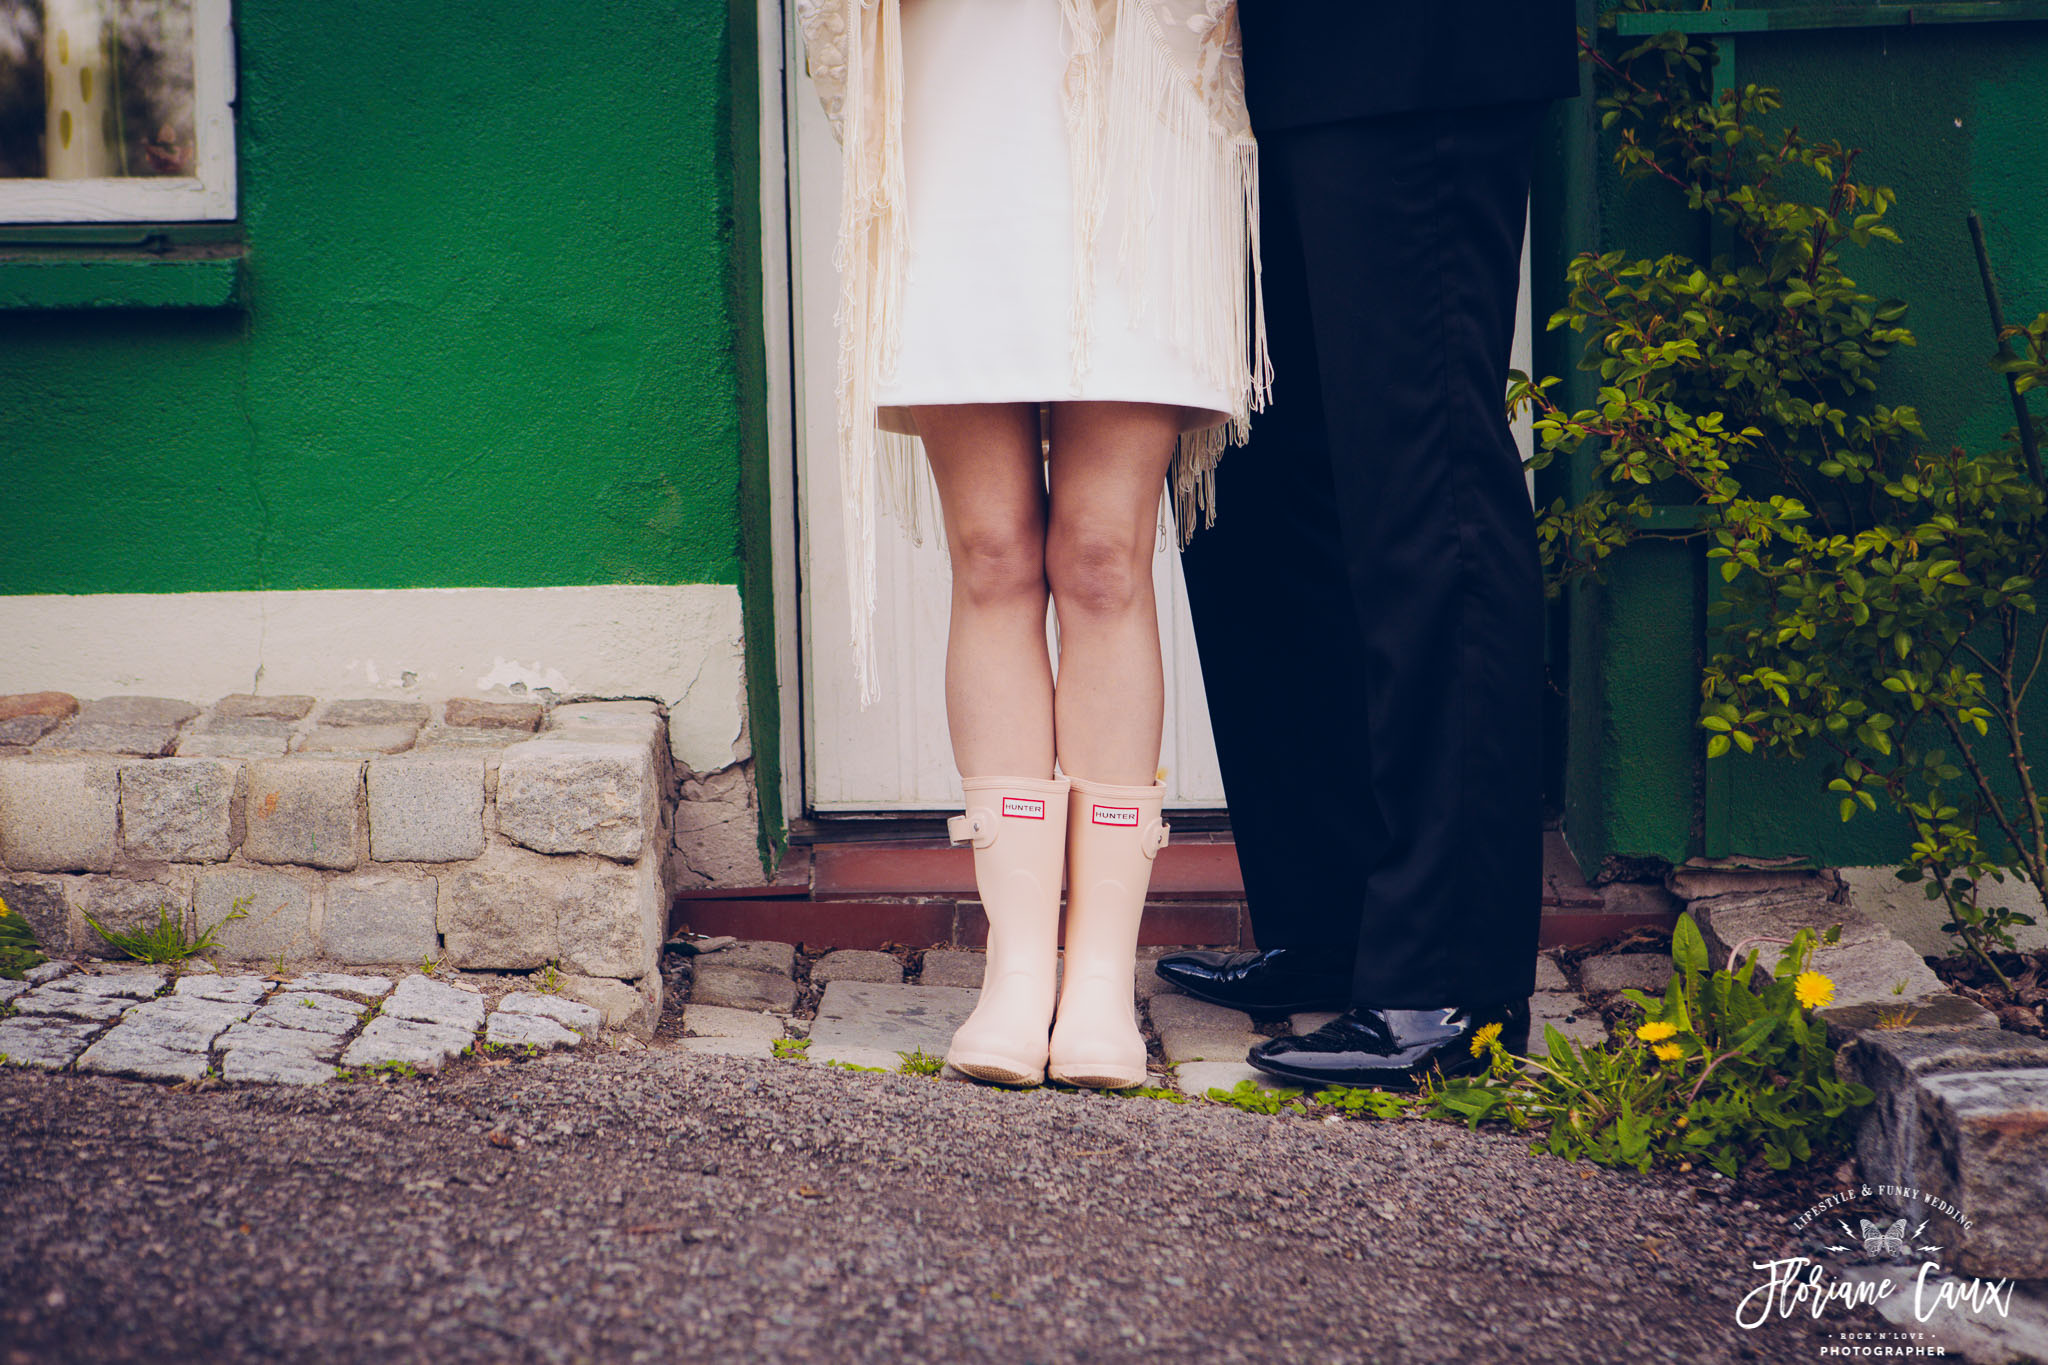 destination-wedding-photographer-oslo-norway-floriane-caux-9